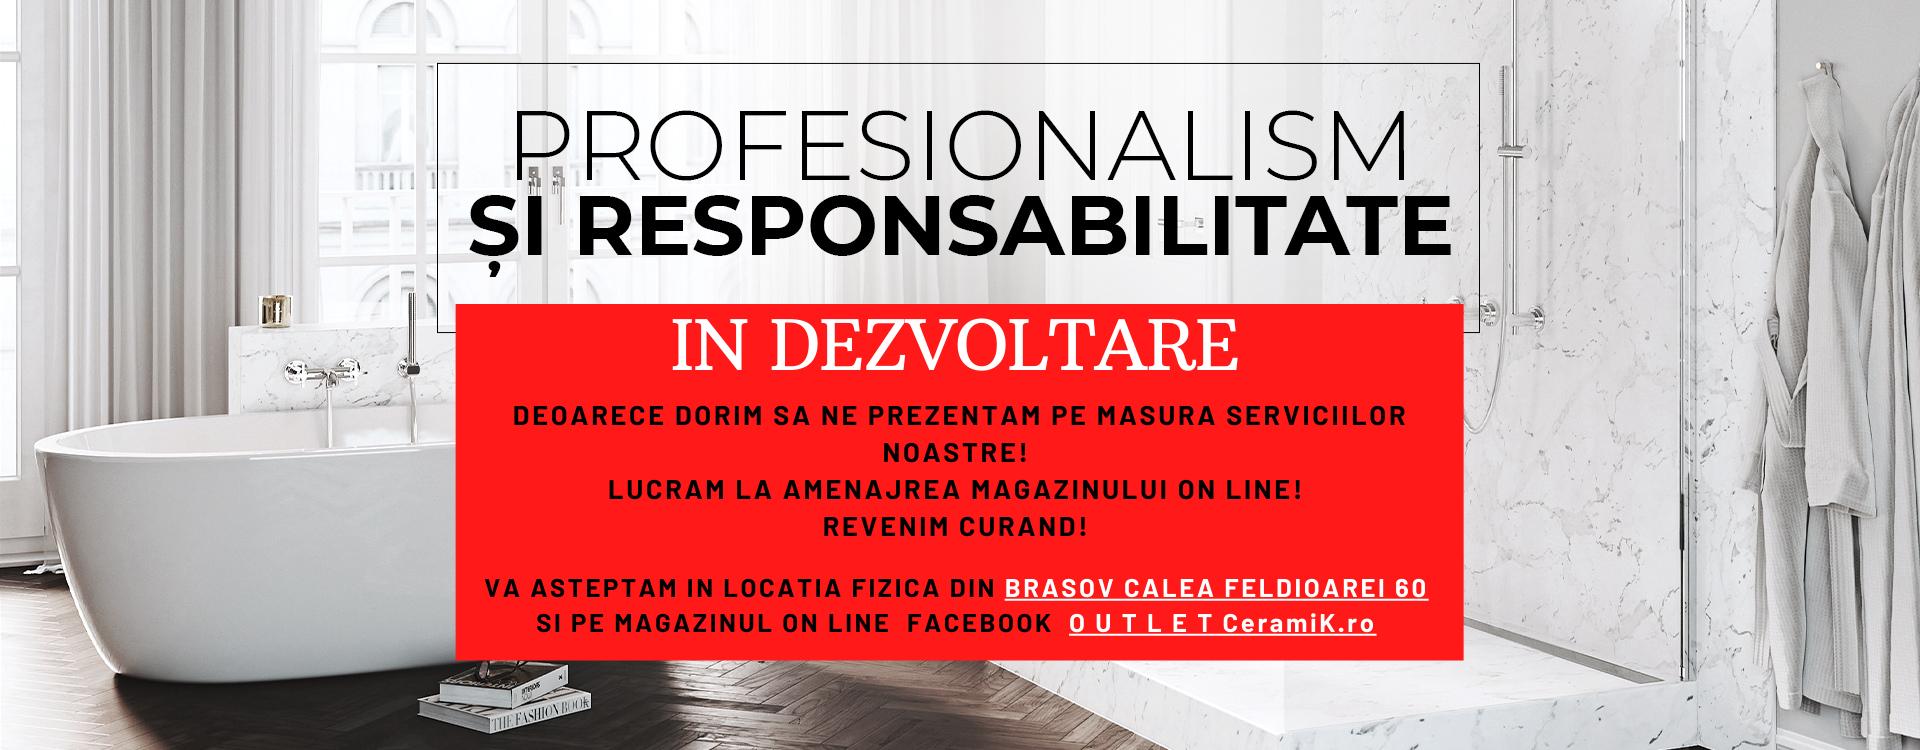 Profesionalism si responsabilitate